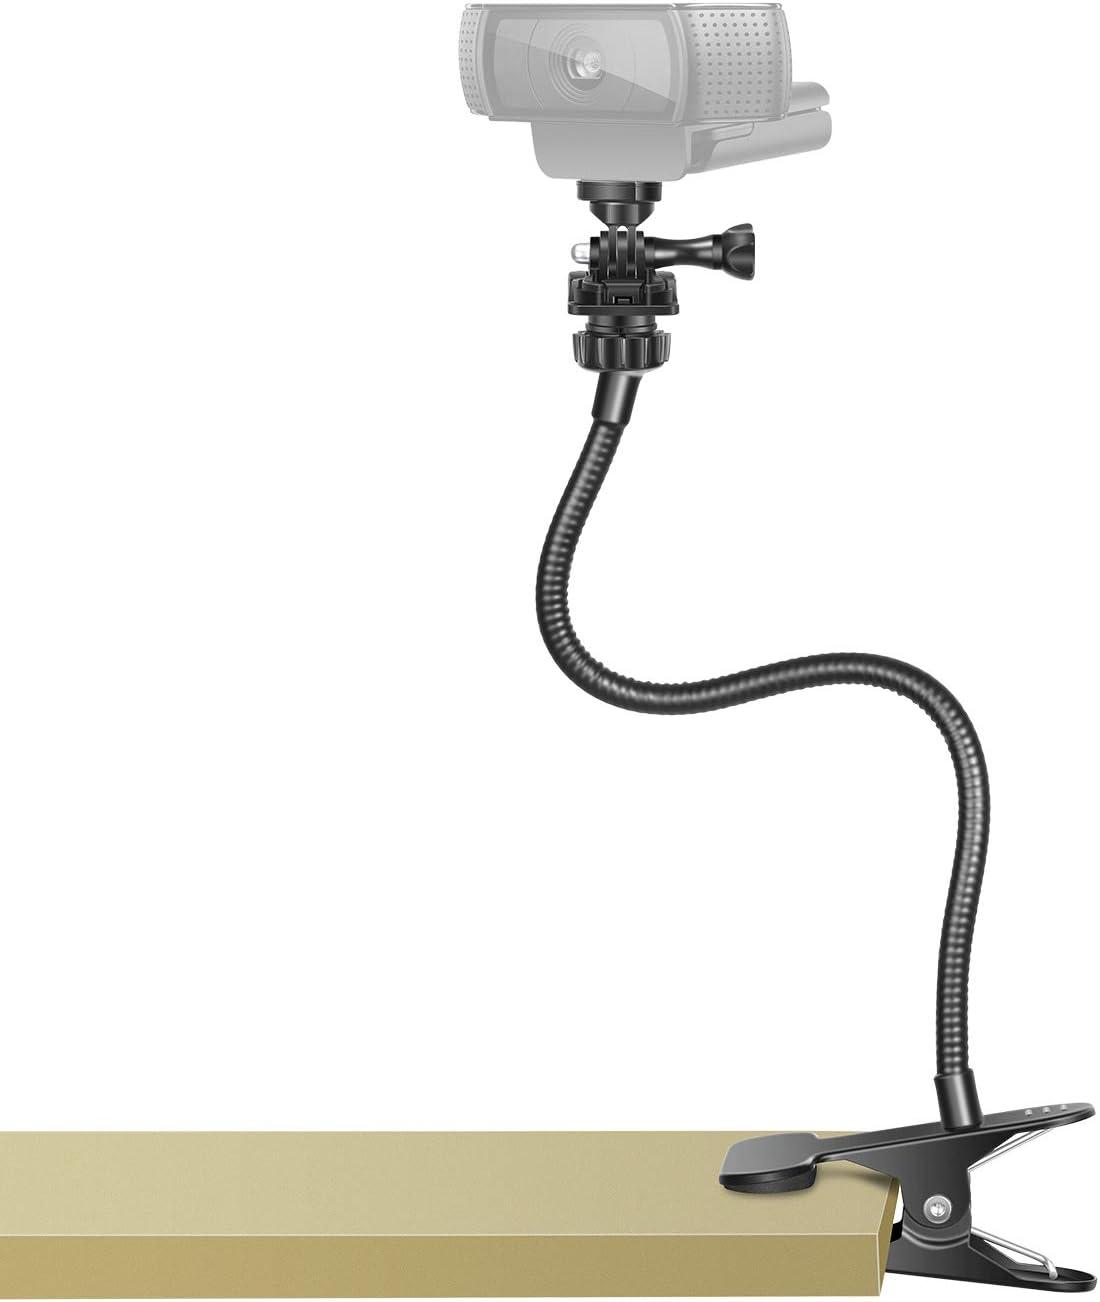 Neewer Webcam Stand Flexible unisex Gooseneck OFFer Clamp De Jaws with